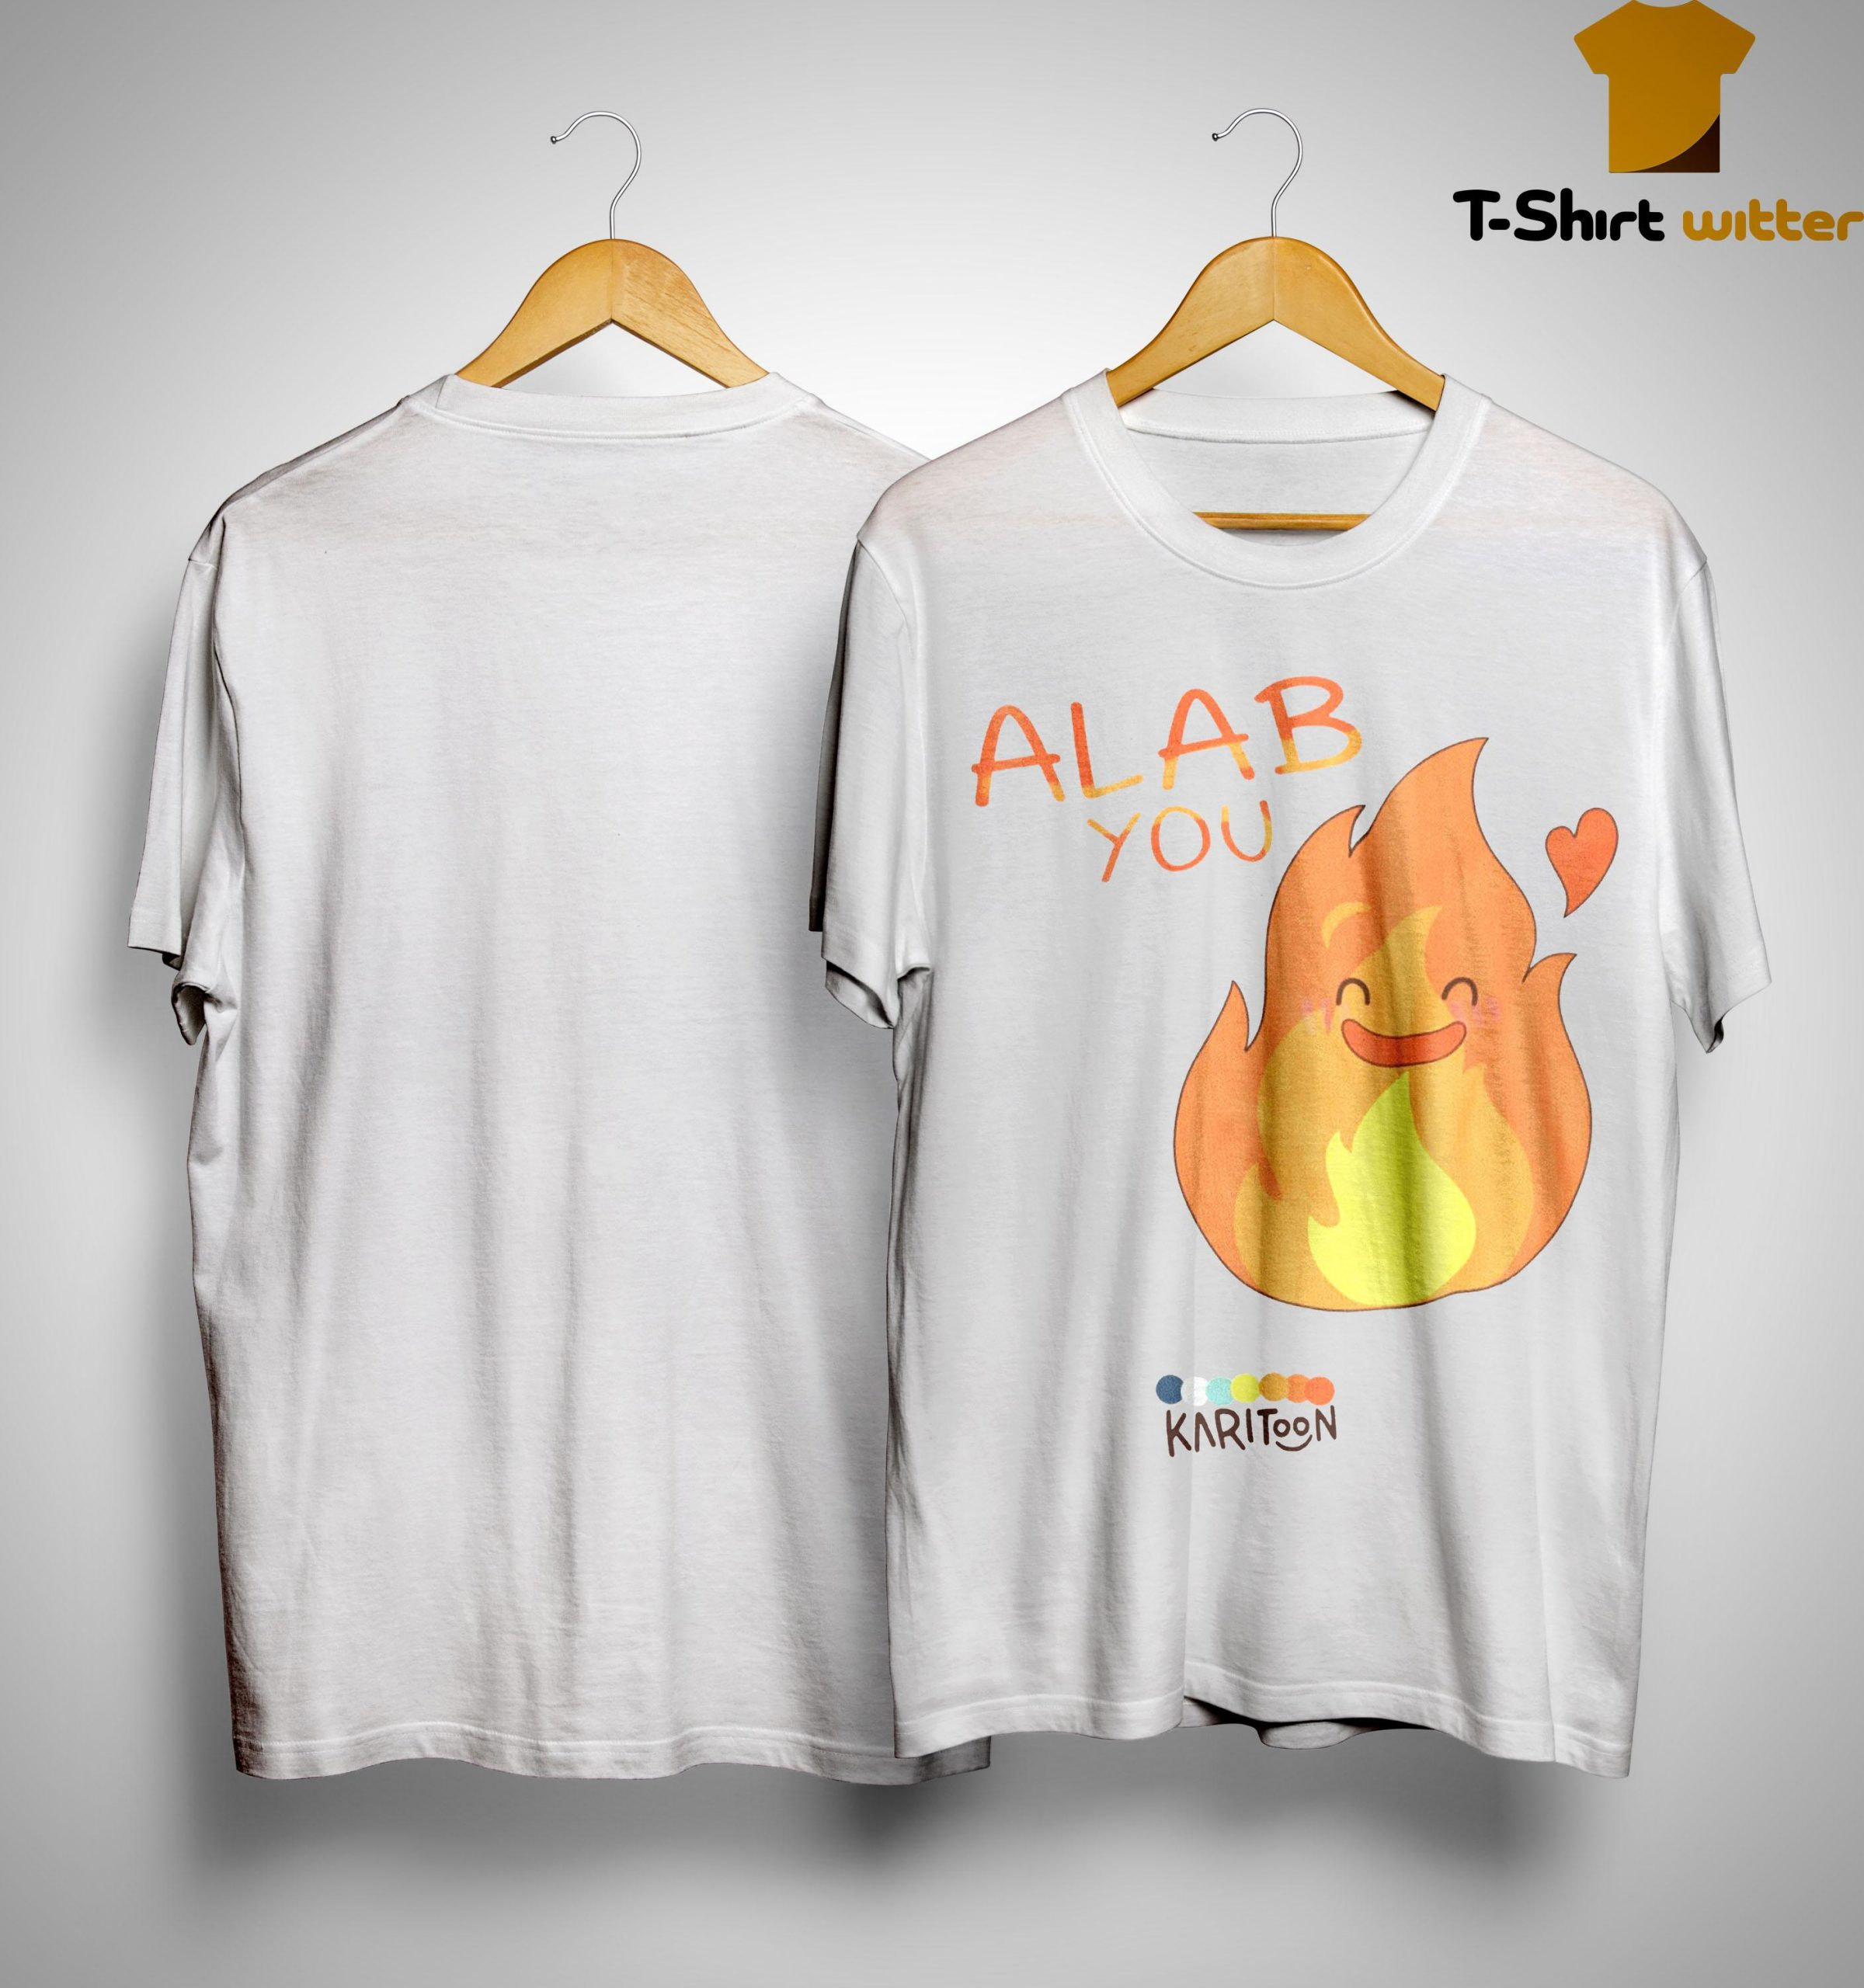 Sb19 Alab You Karitoon Shirt